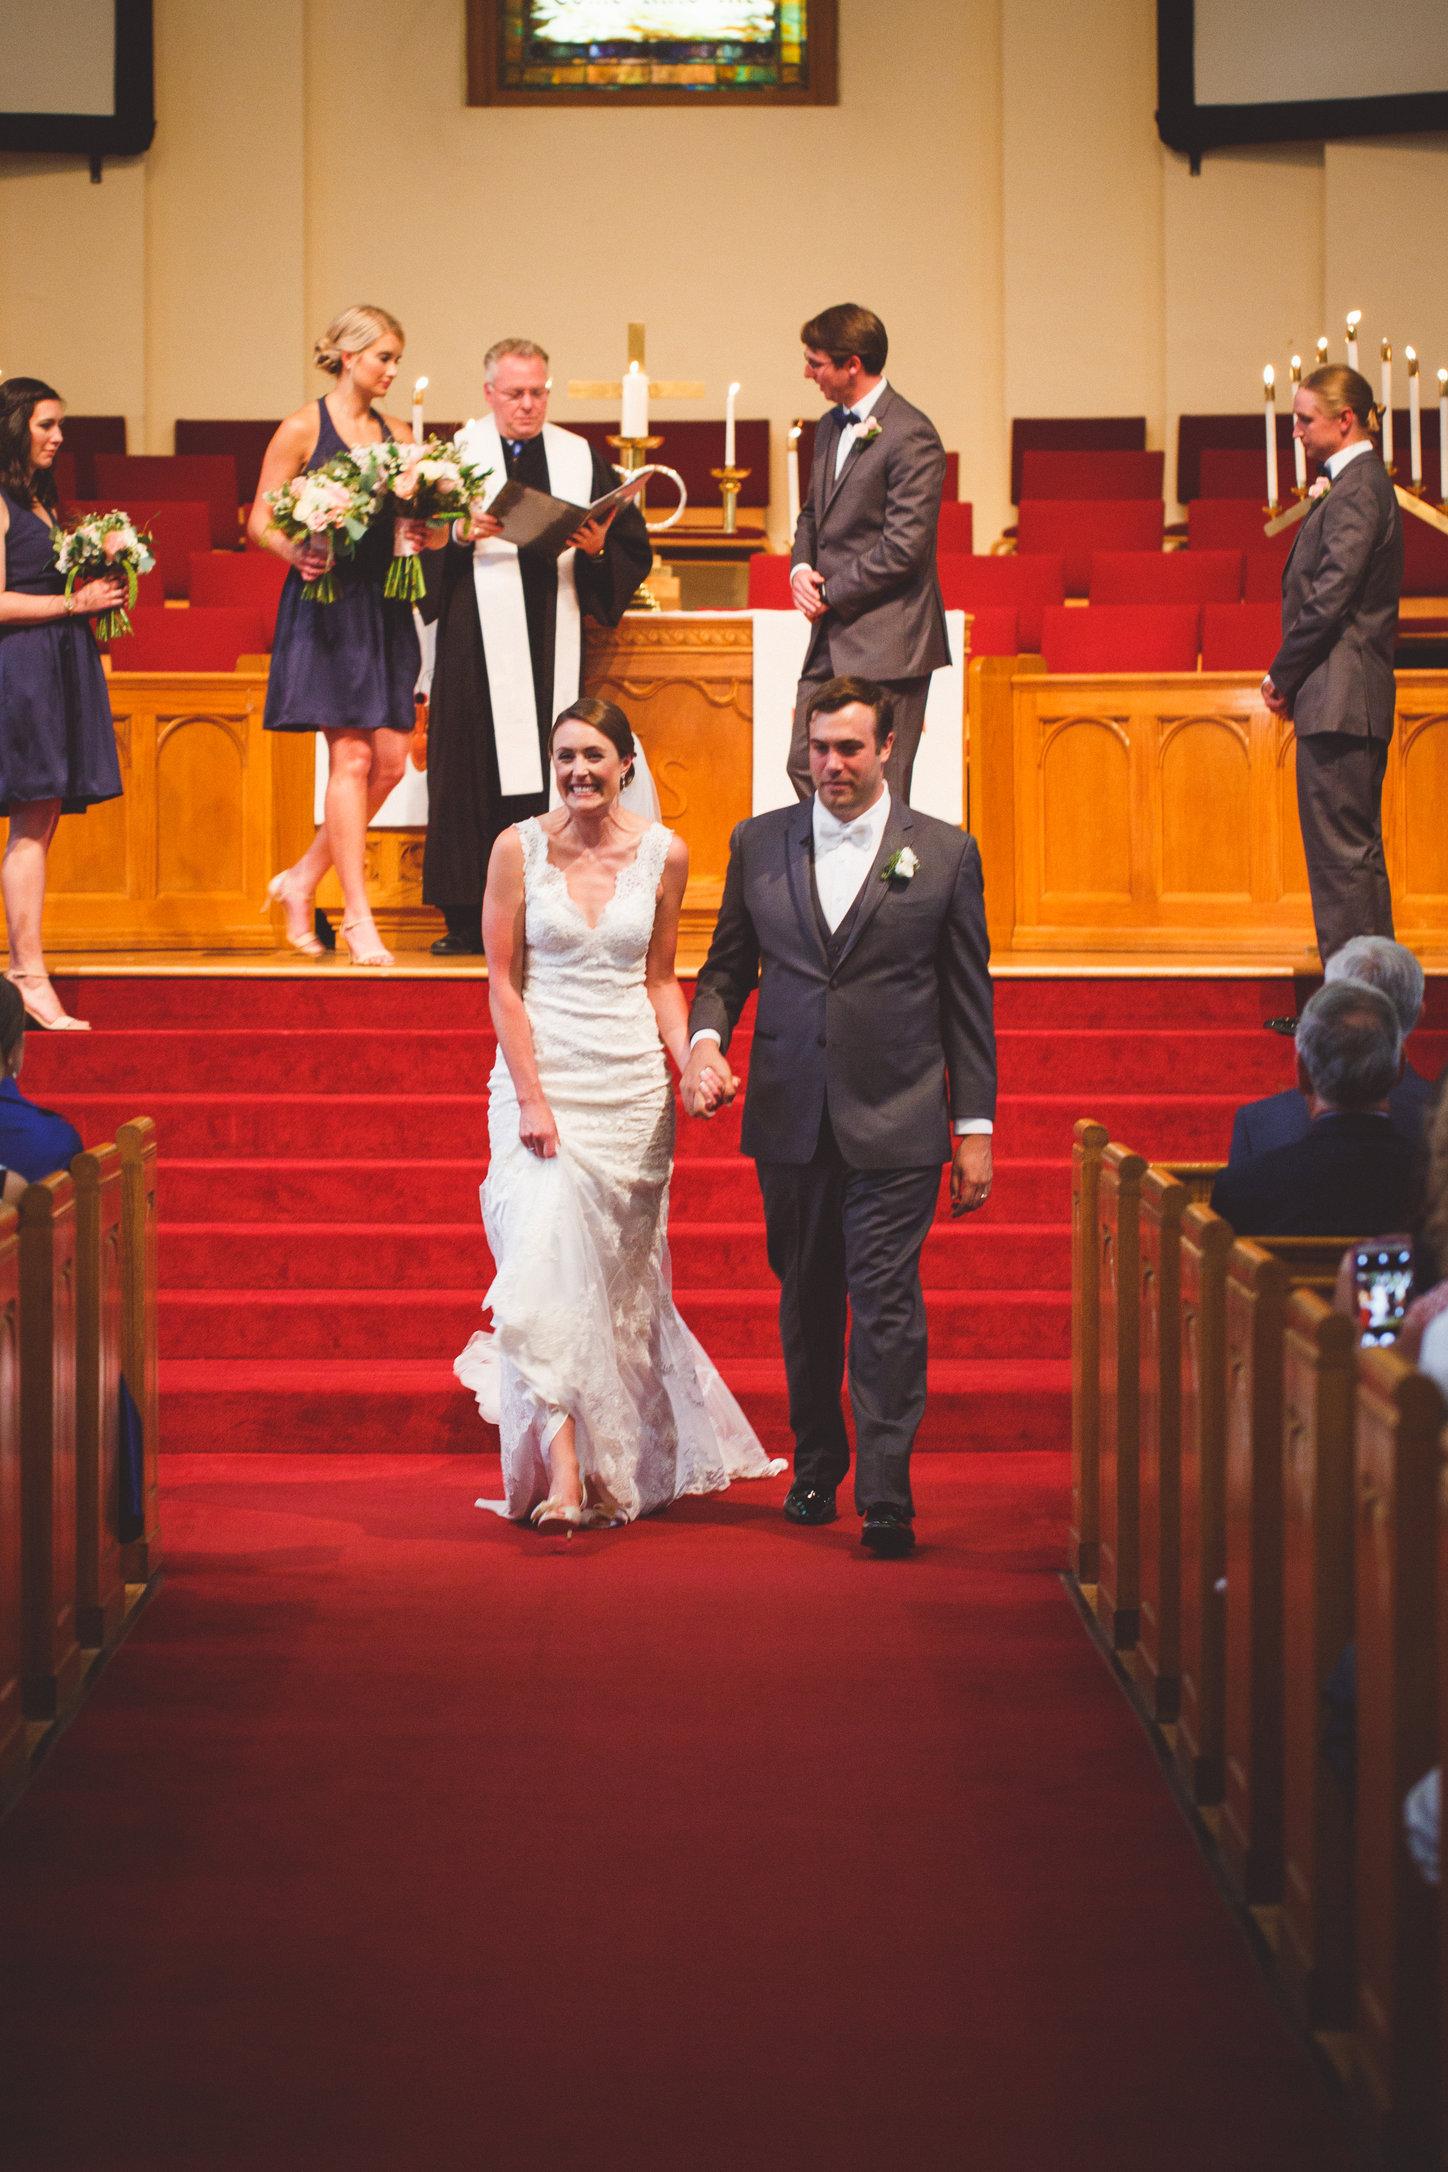 SandC-wedding-228.jpg